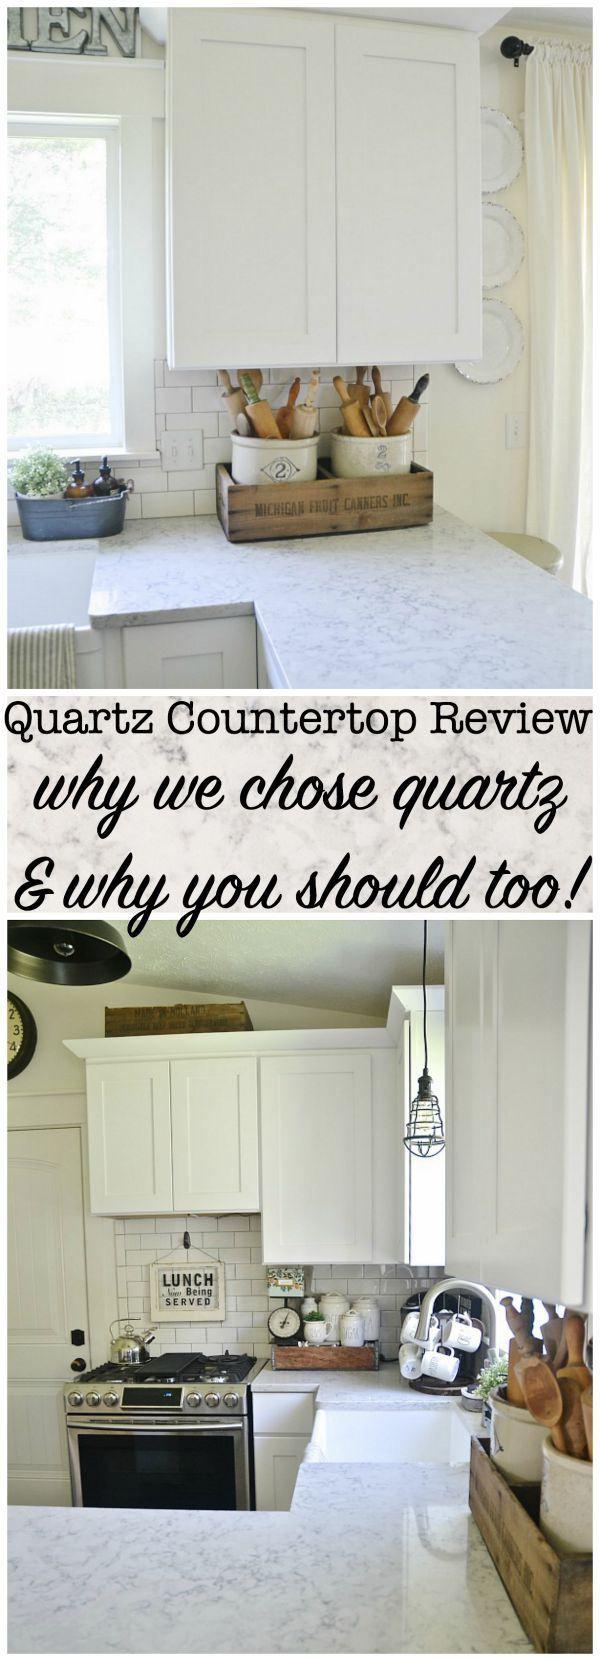 Quartz Countertop Review - Pros & Cons | DIY Ideas | Pinterest ...